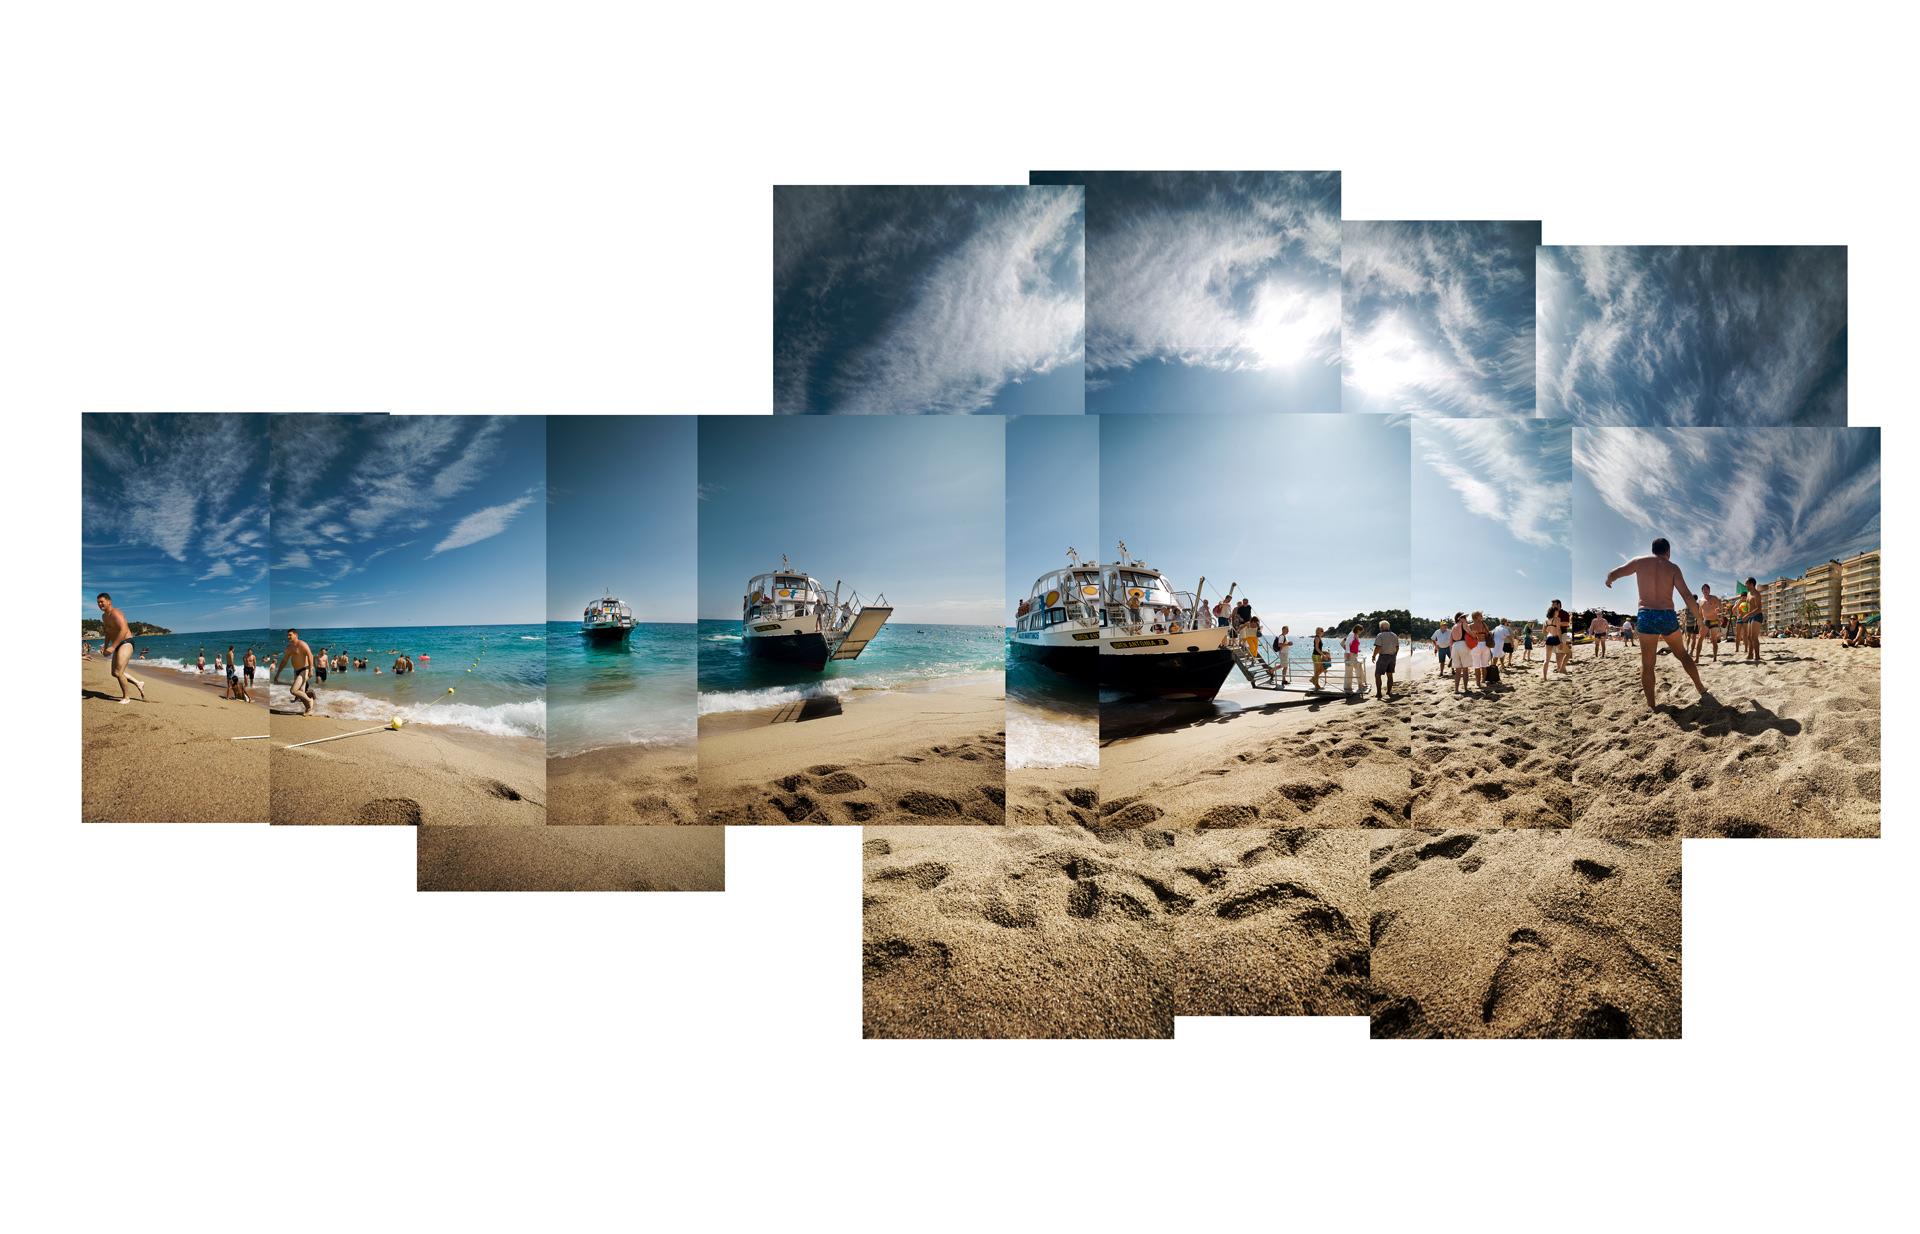 ©ankeluckmann641, ADAC, Reisemagazin, beach, spain, costa brava, people, landscape